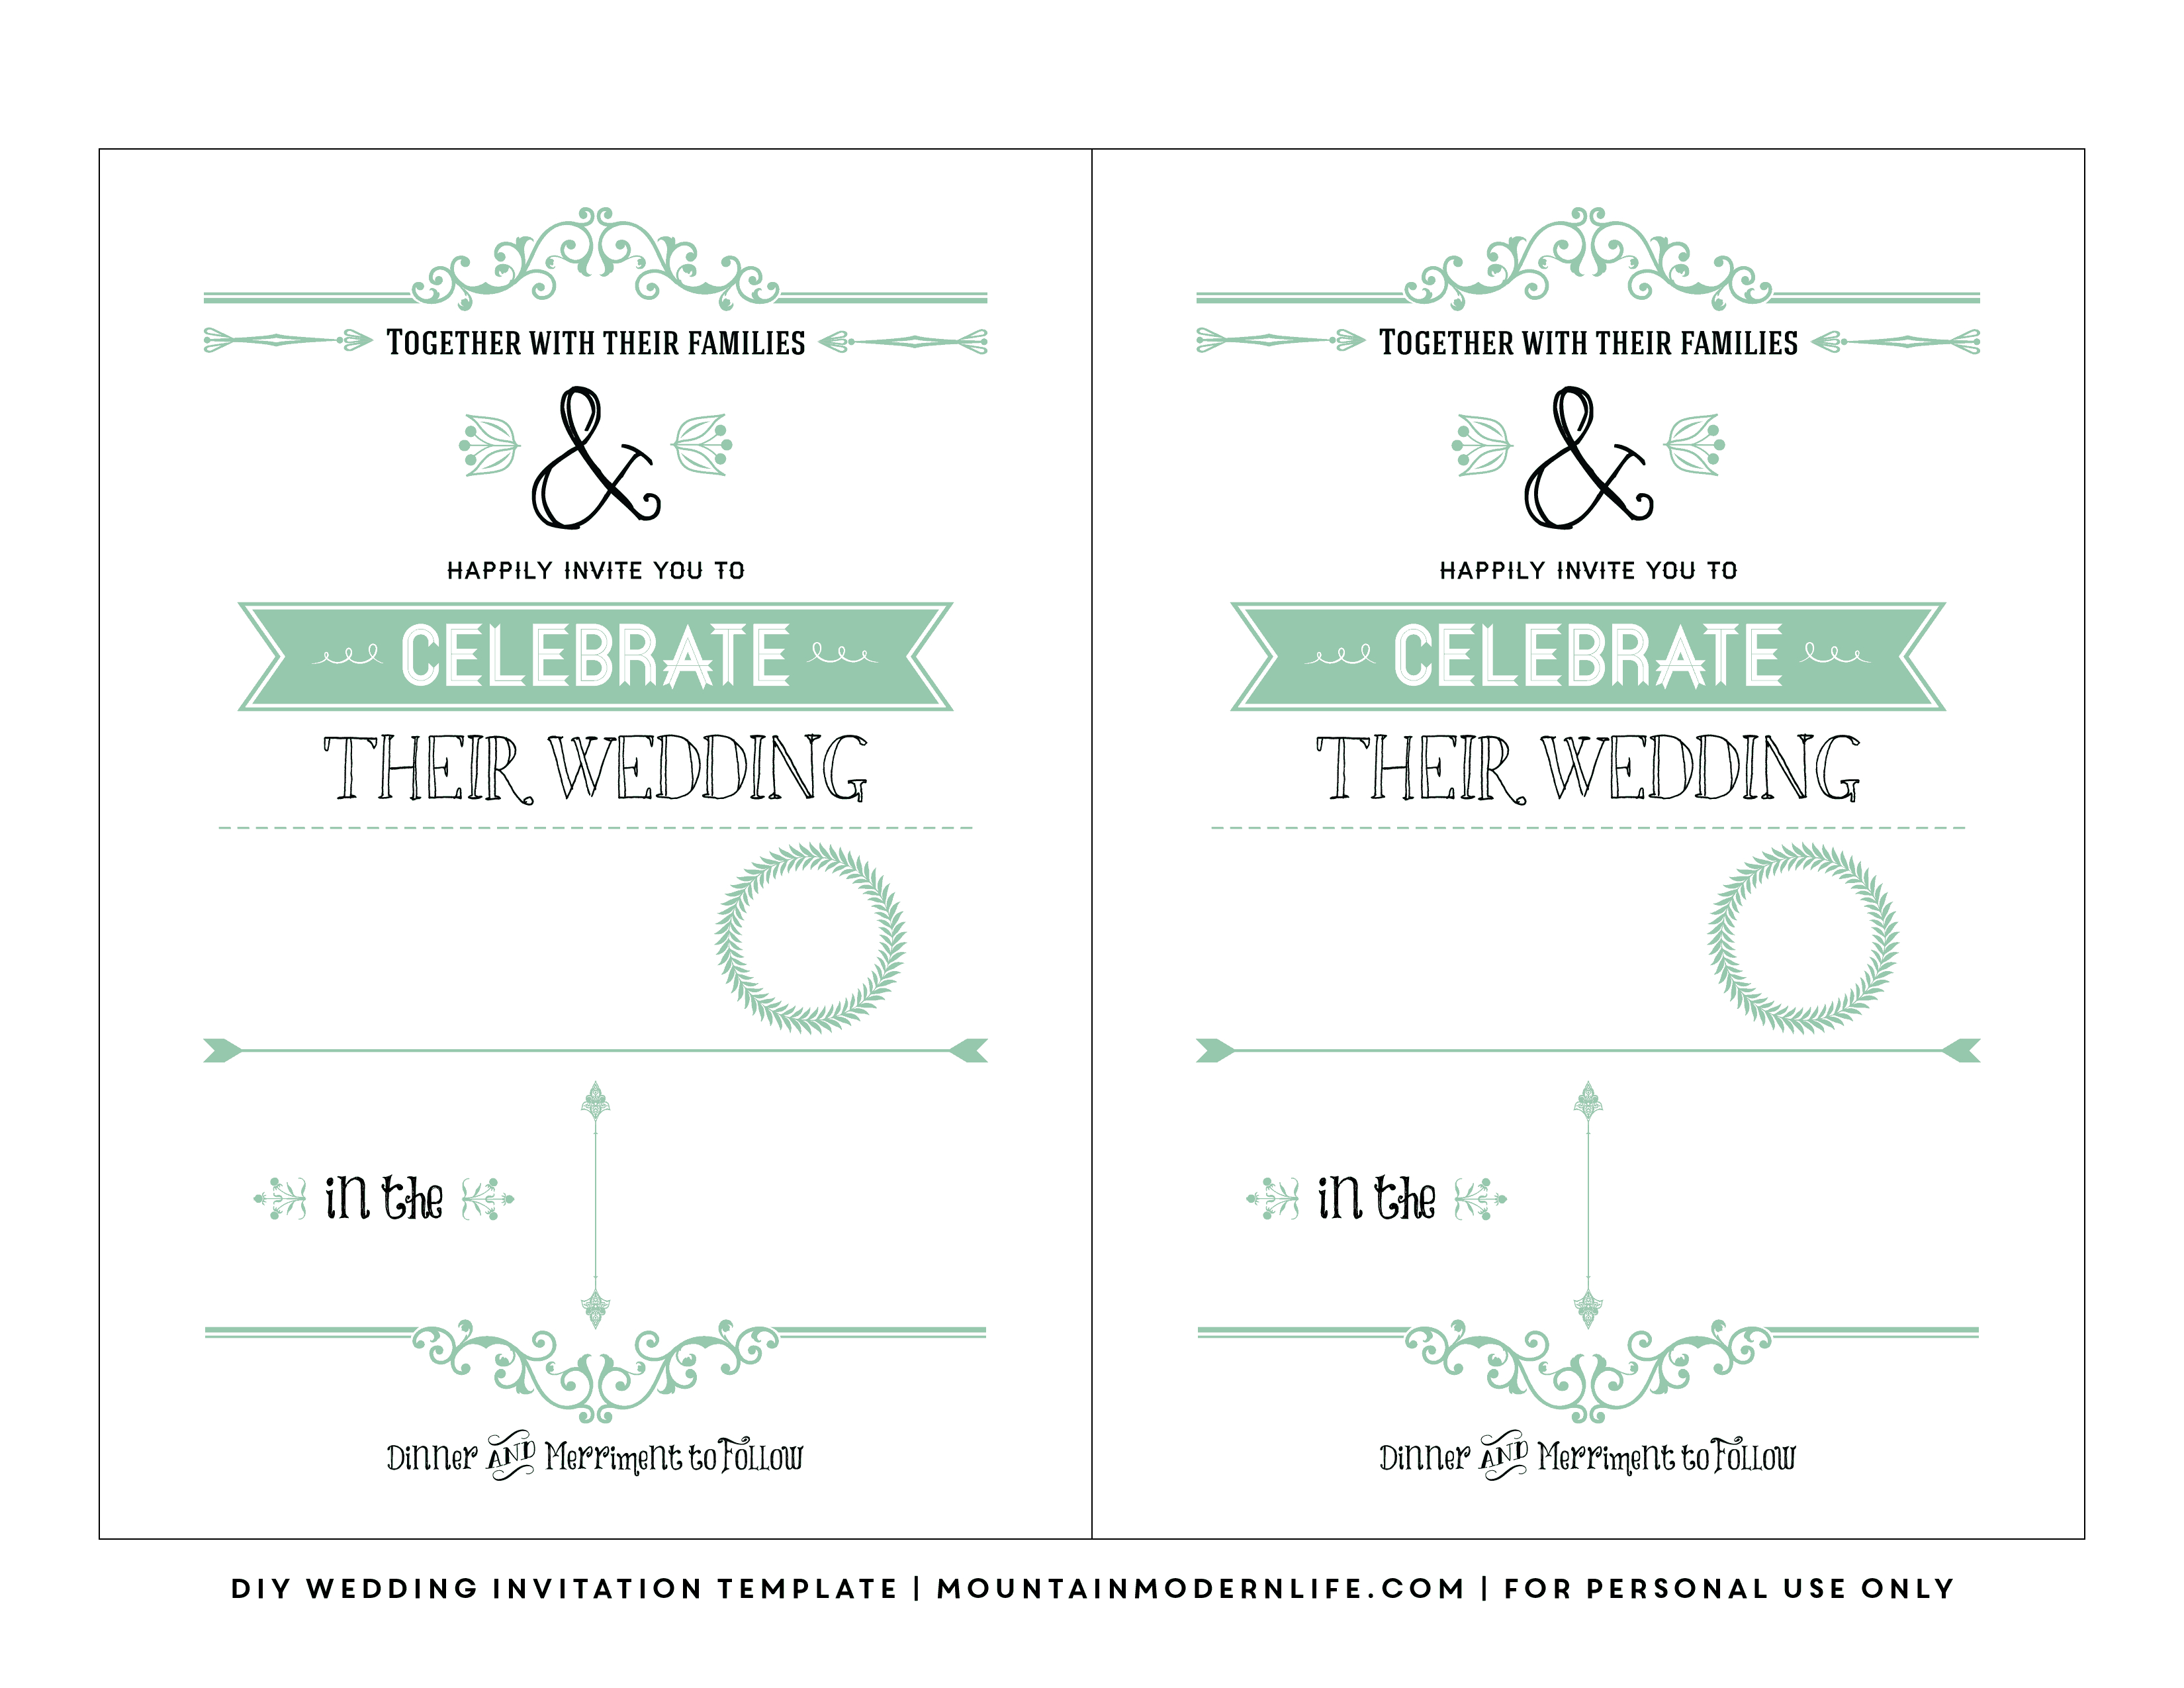 Free Wedding Invitation Template   Mountainmodernlife - Free Printable Wedding Invitations Templates Downloads